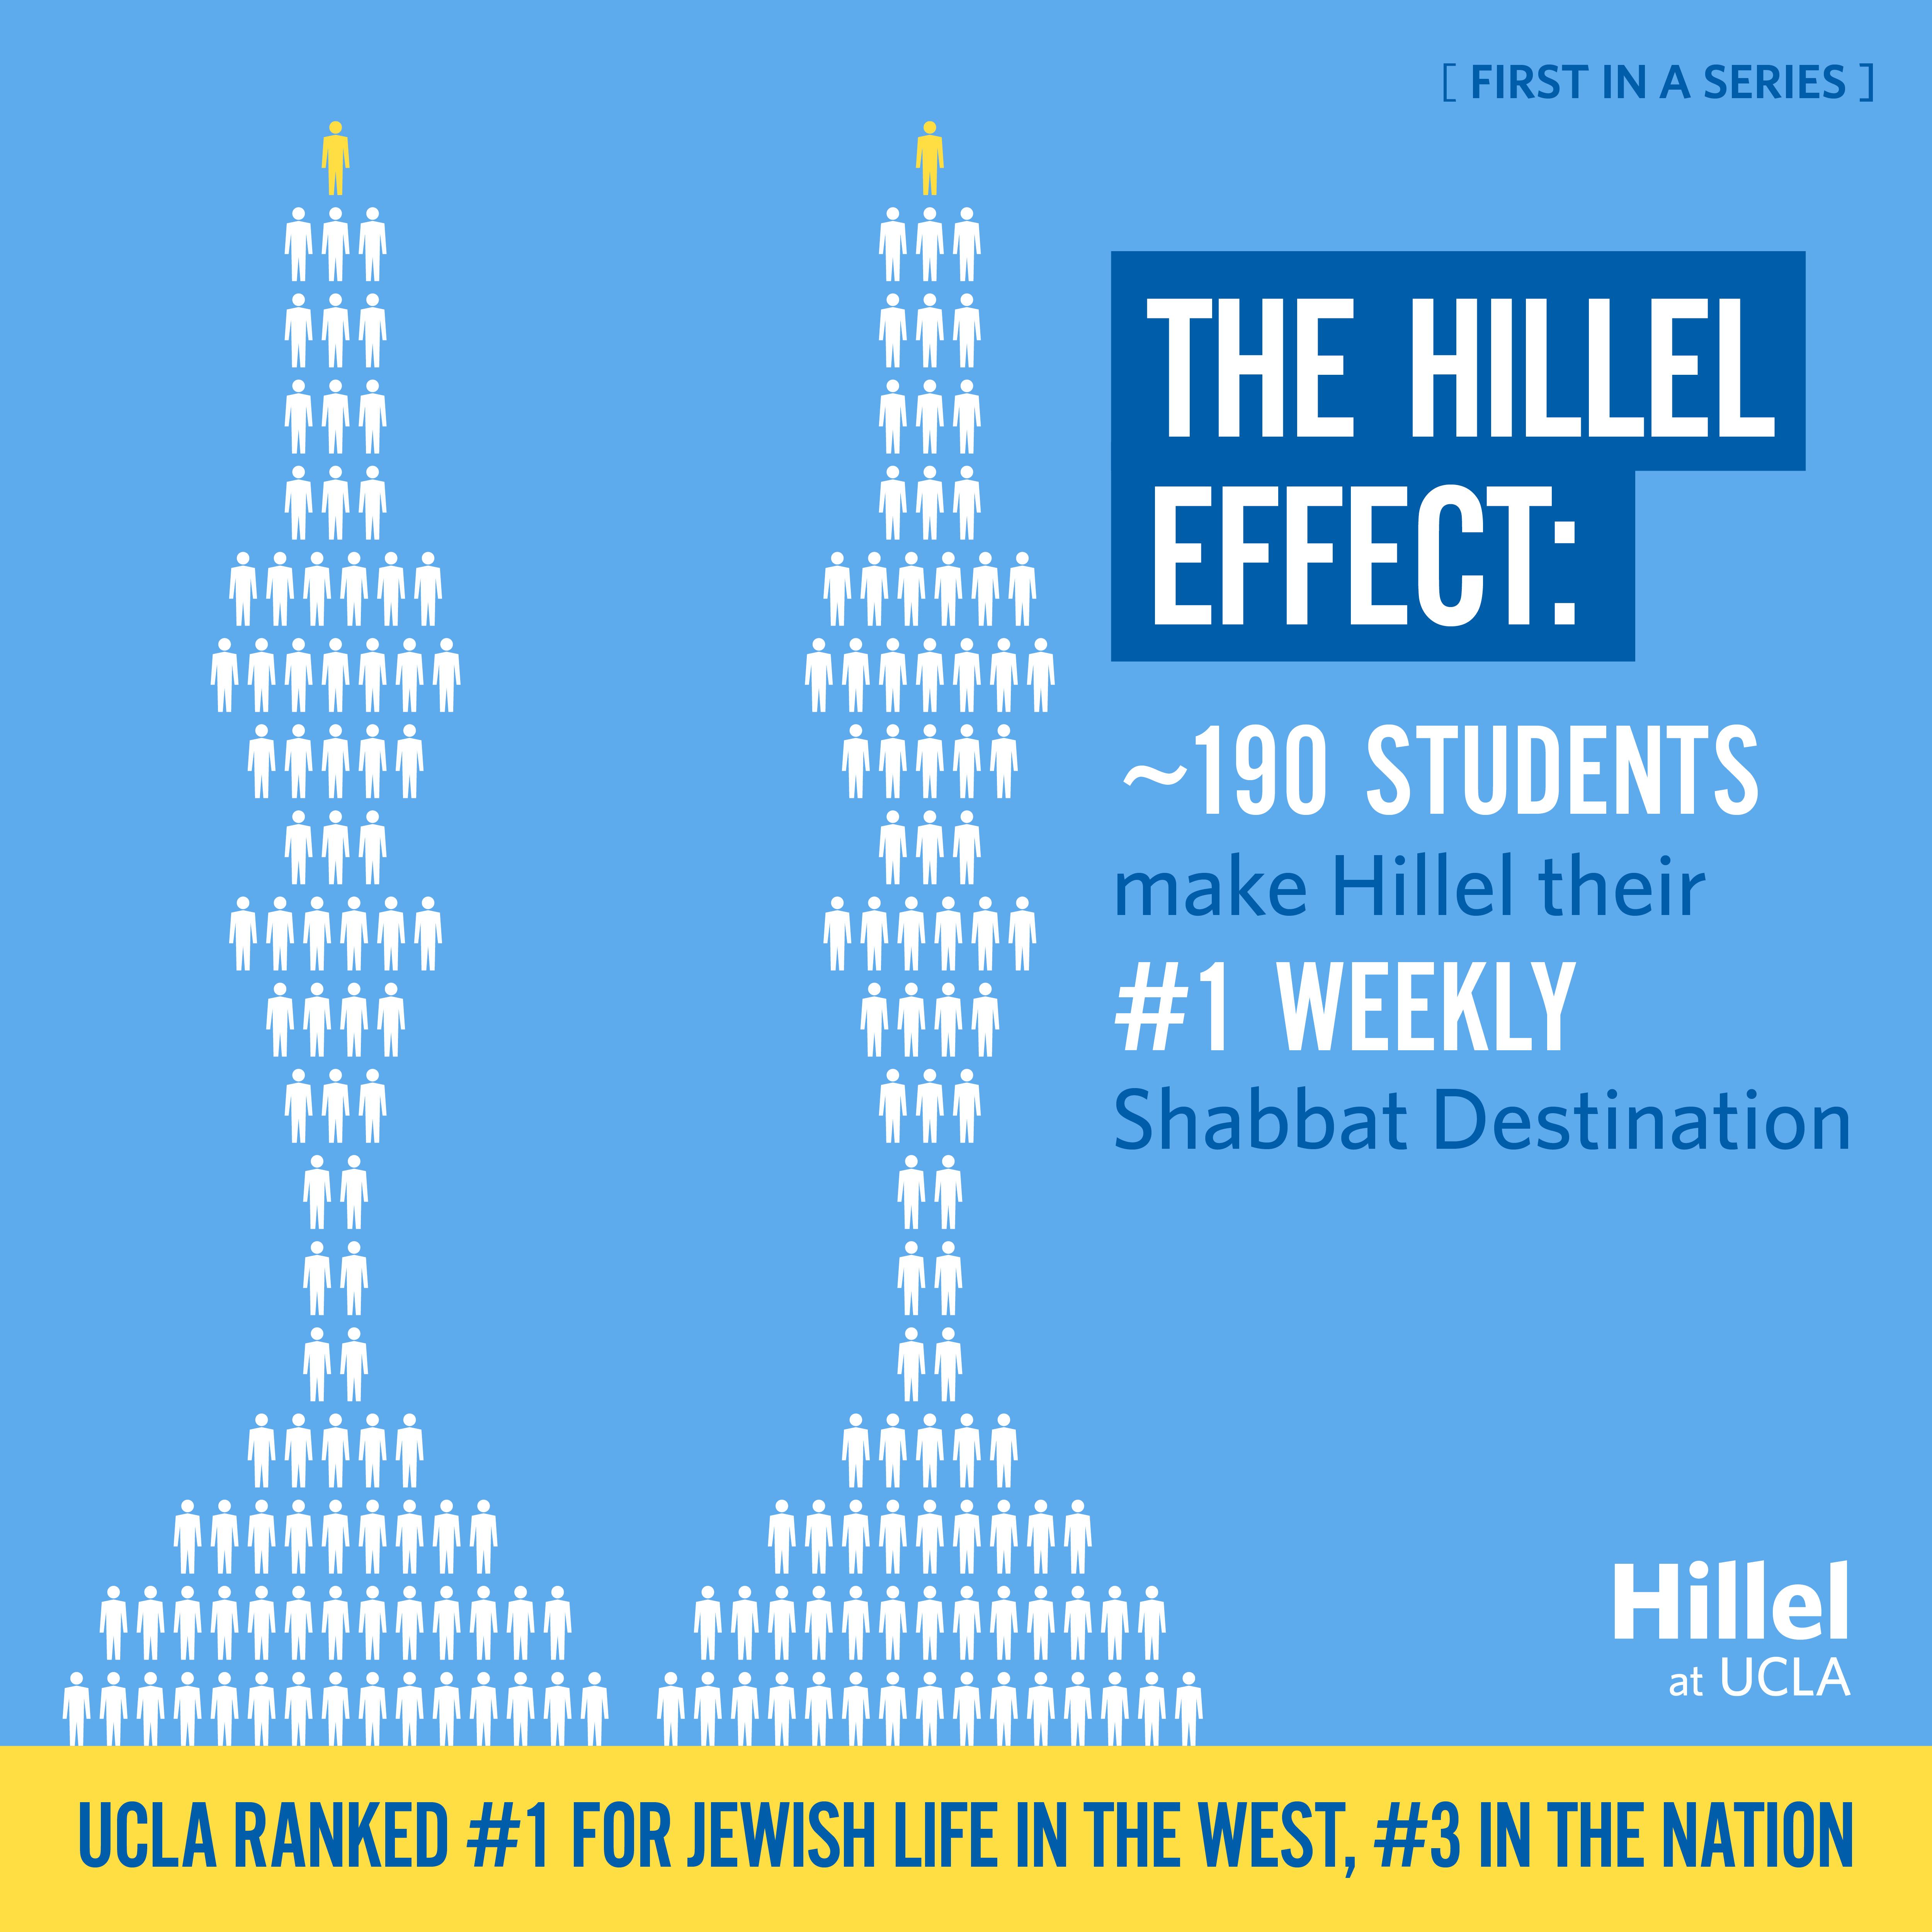 Hillel_BestinWest_Infographic_v4_300dpi.jpg